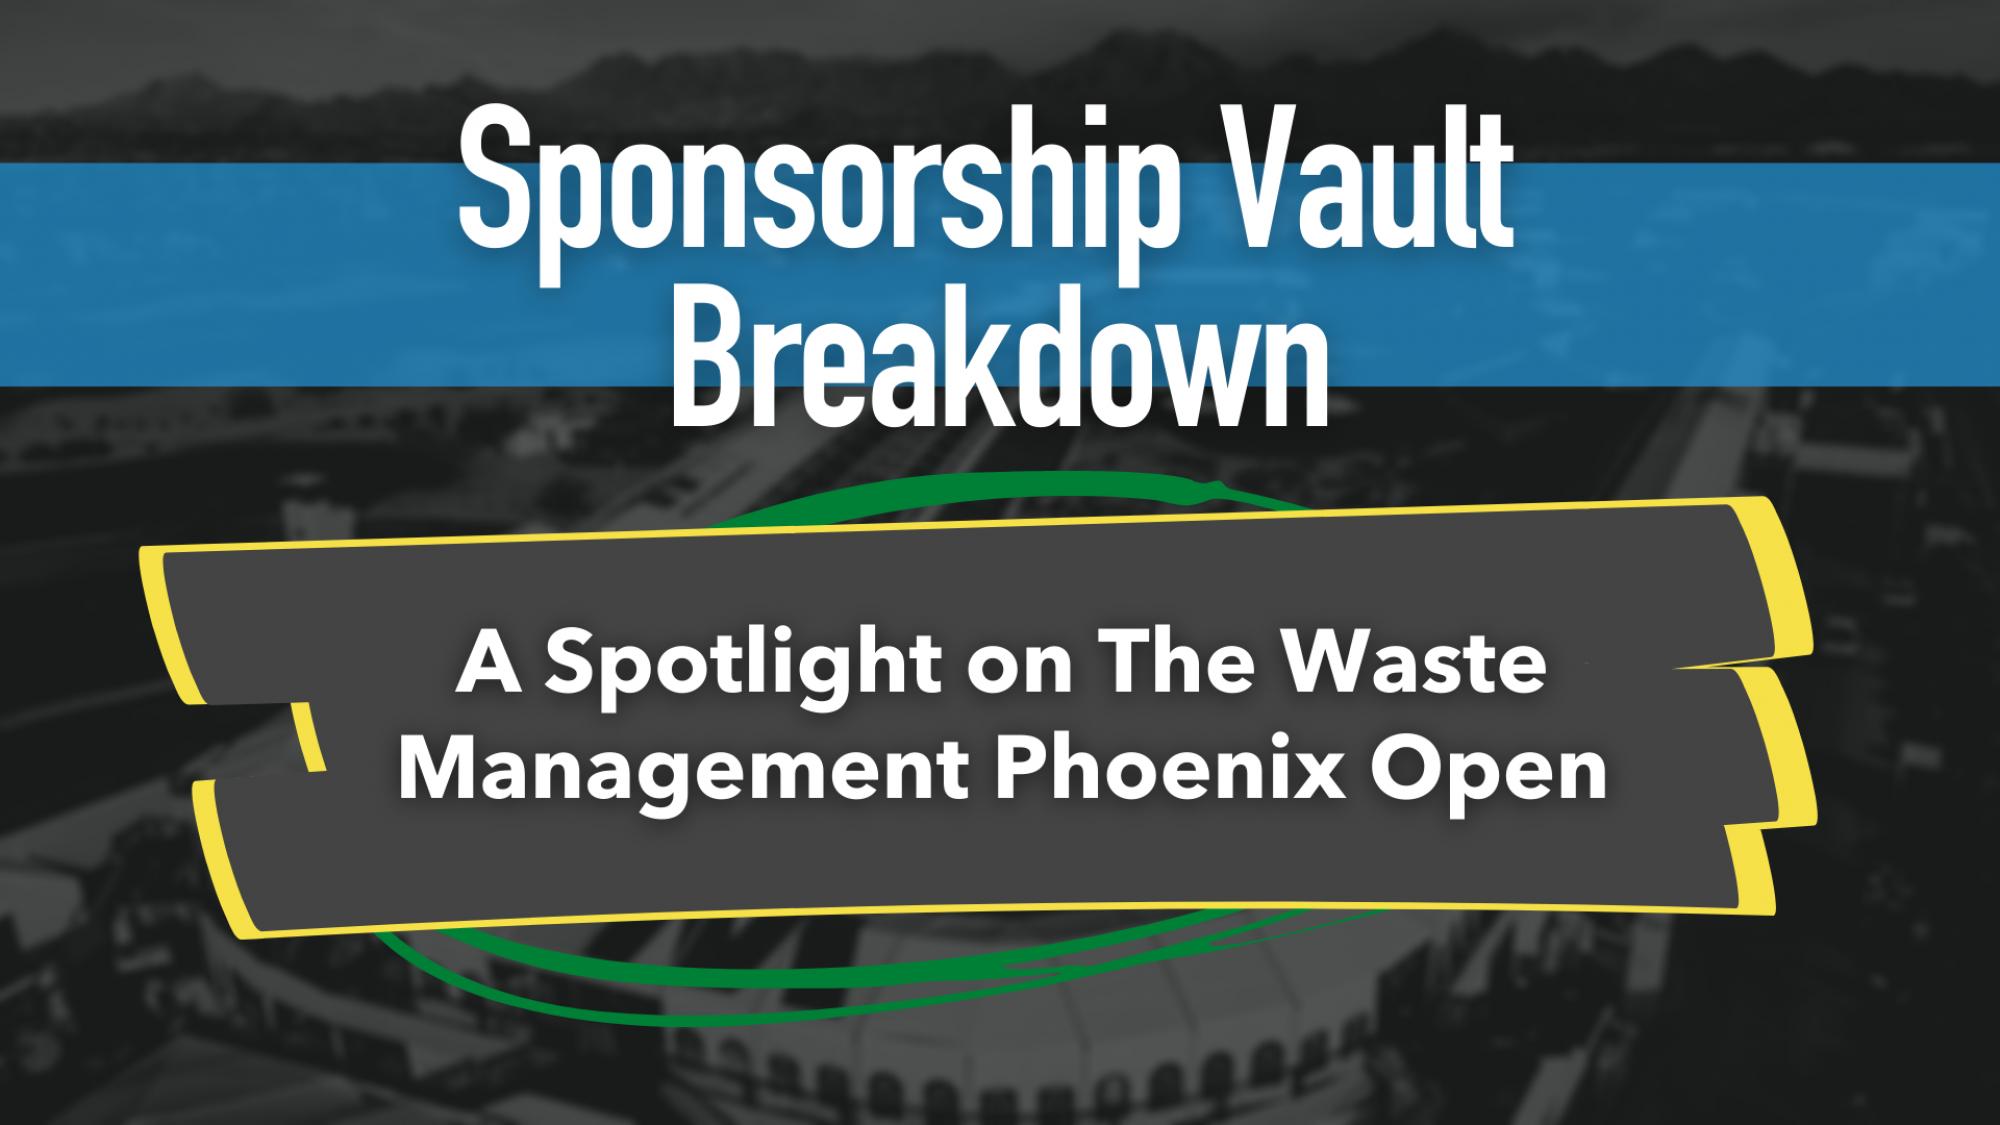 Waste Management Pheonix Open Sponsorship Breakdown by Trak Software